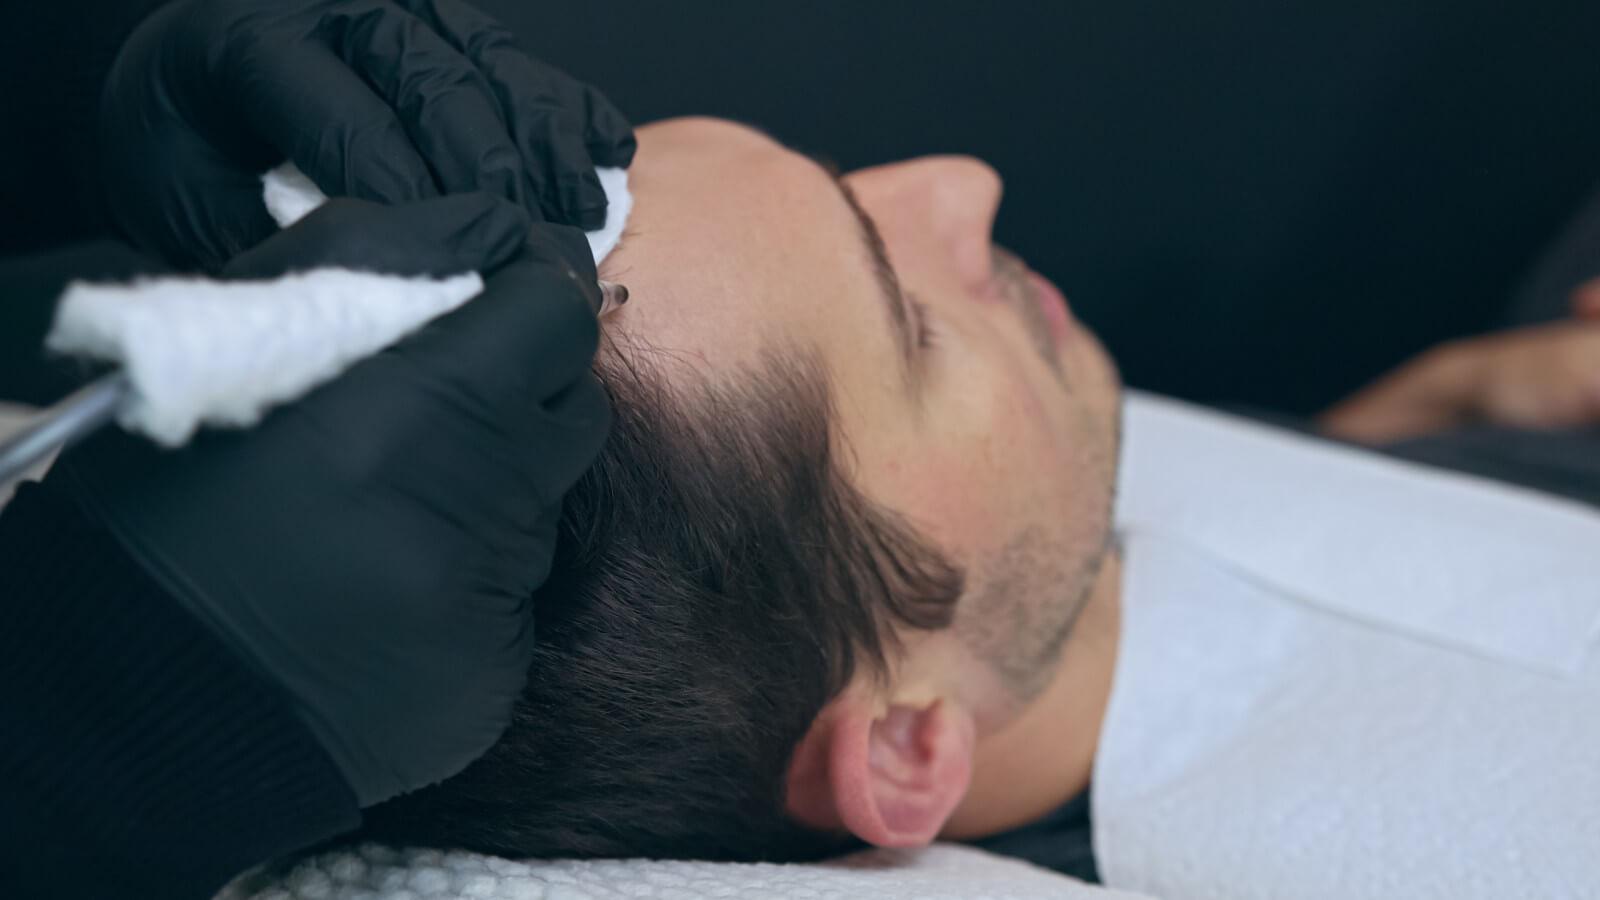 man undergoes scalp micropigmentation